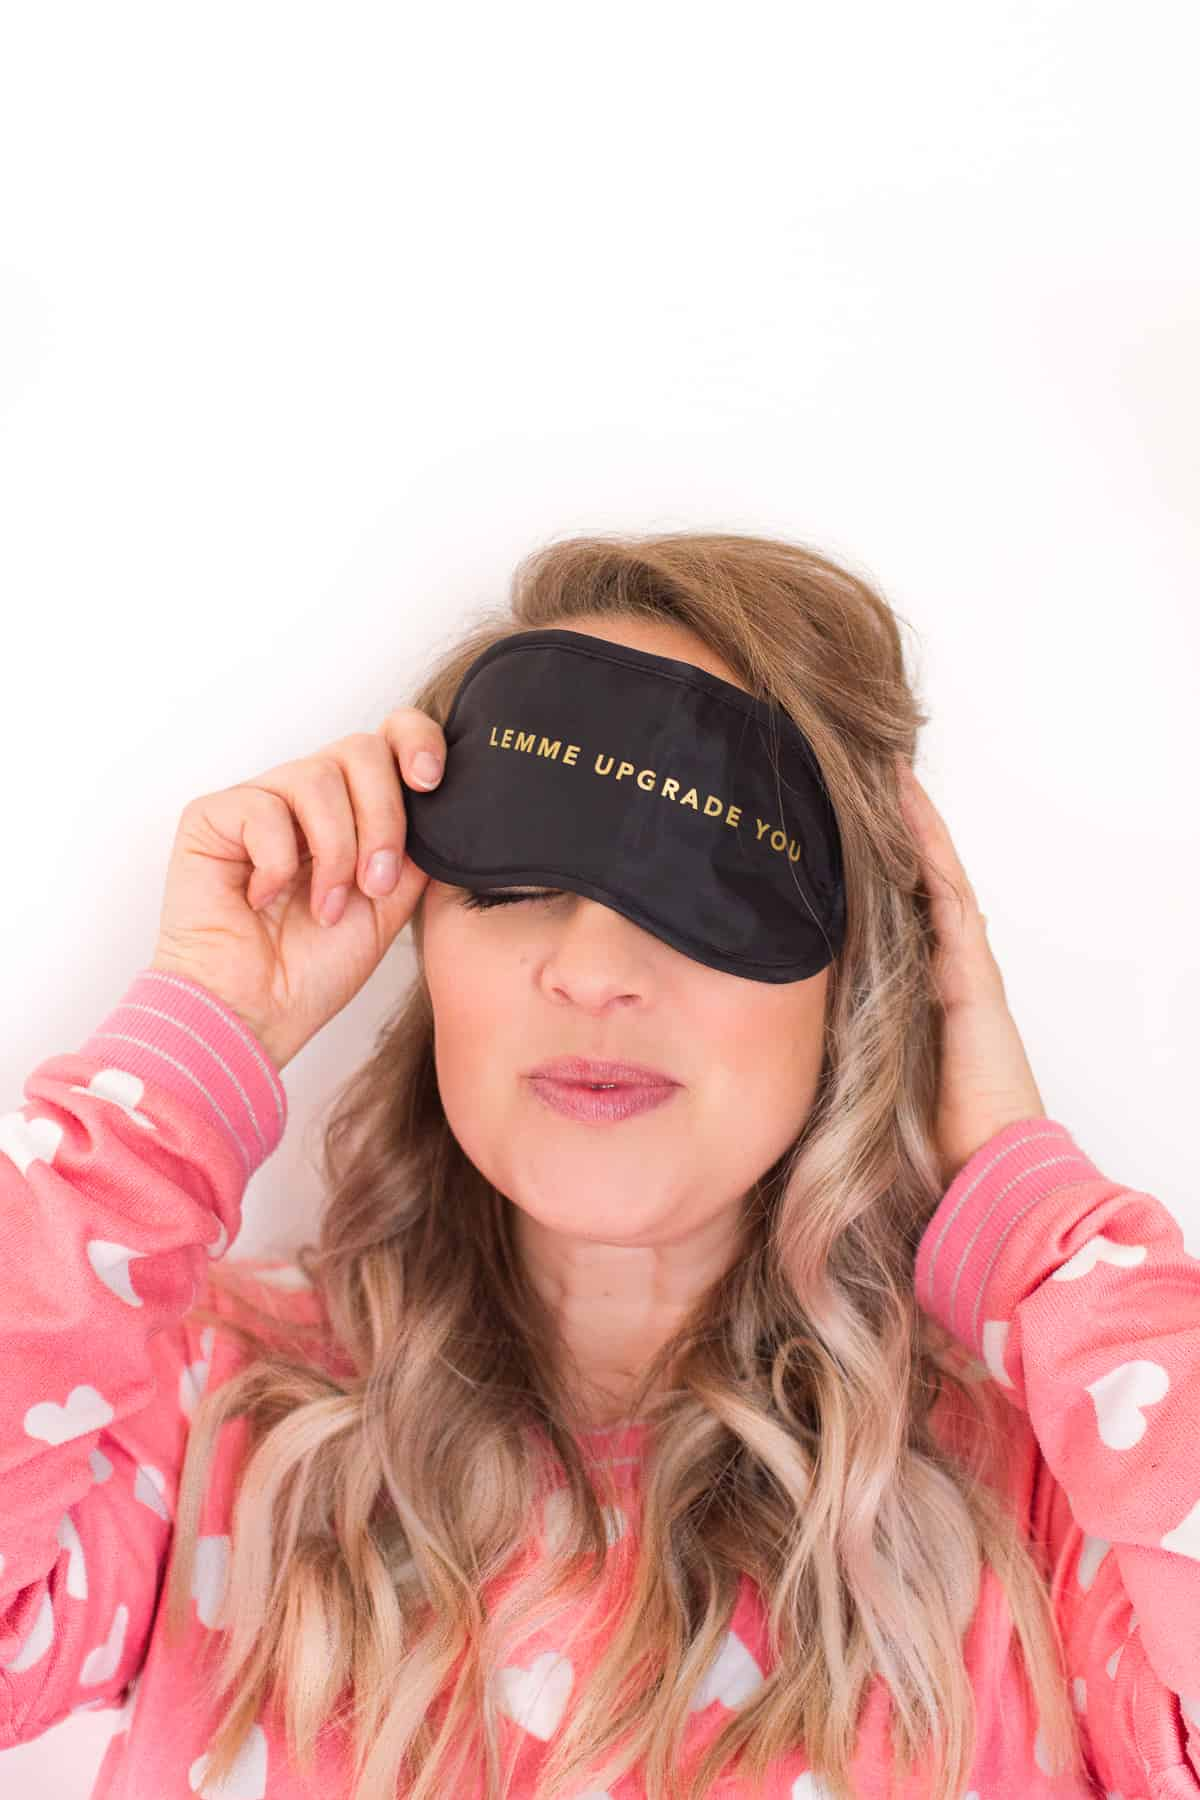 Survival Kit Party Favor WhiteGold Bachelorette Hangover Eye Mask Save on Sets Travel Sleep Mask Girl/'s Trip Feyonce Beyonce Eye Mask